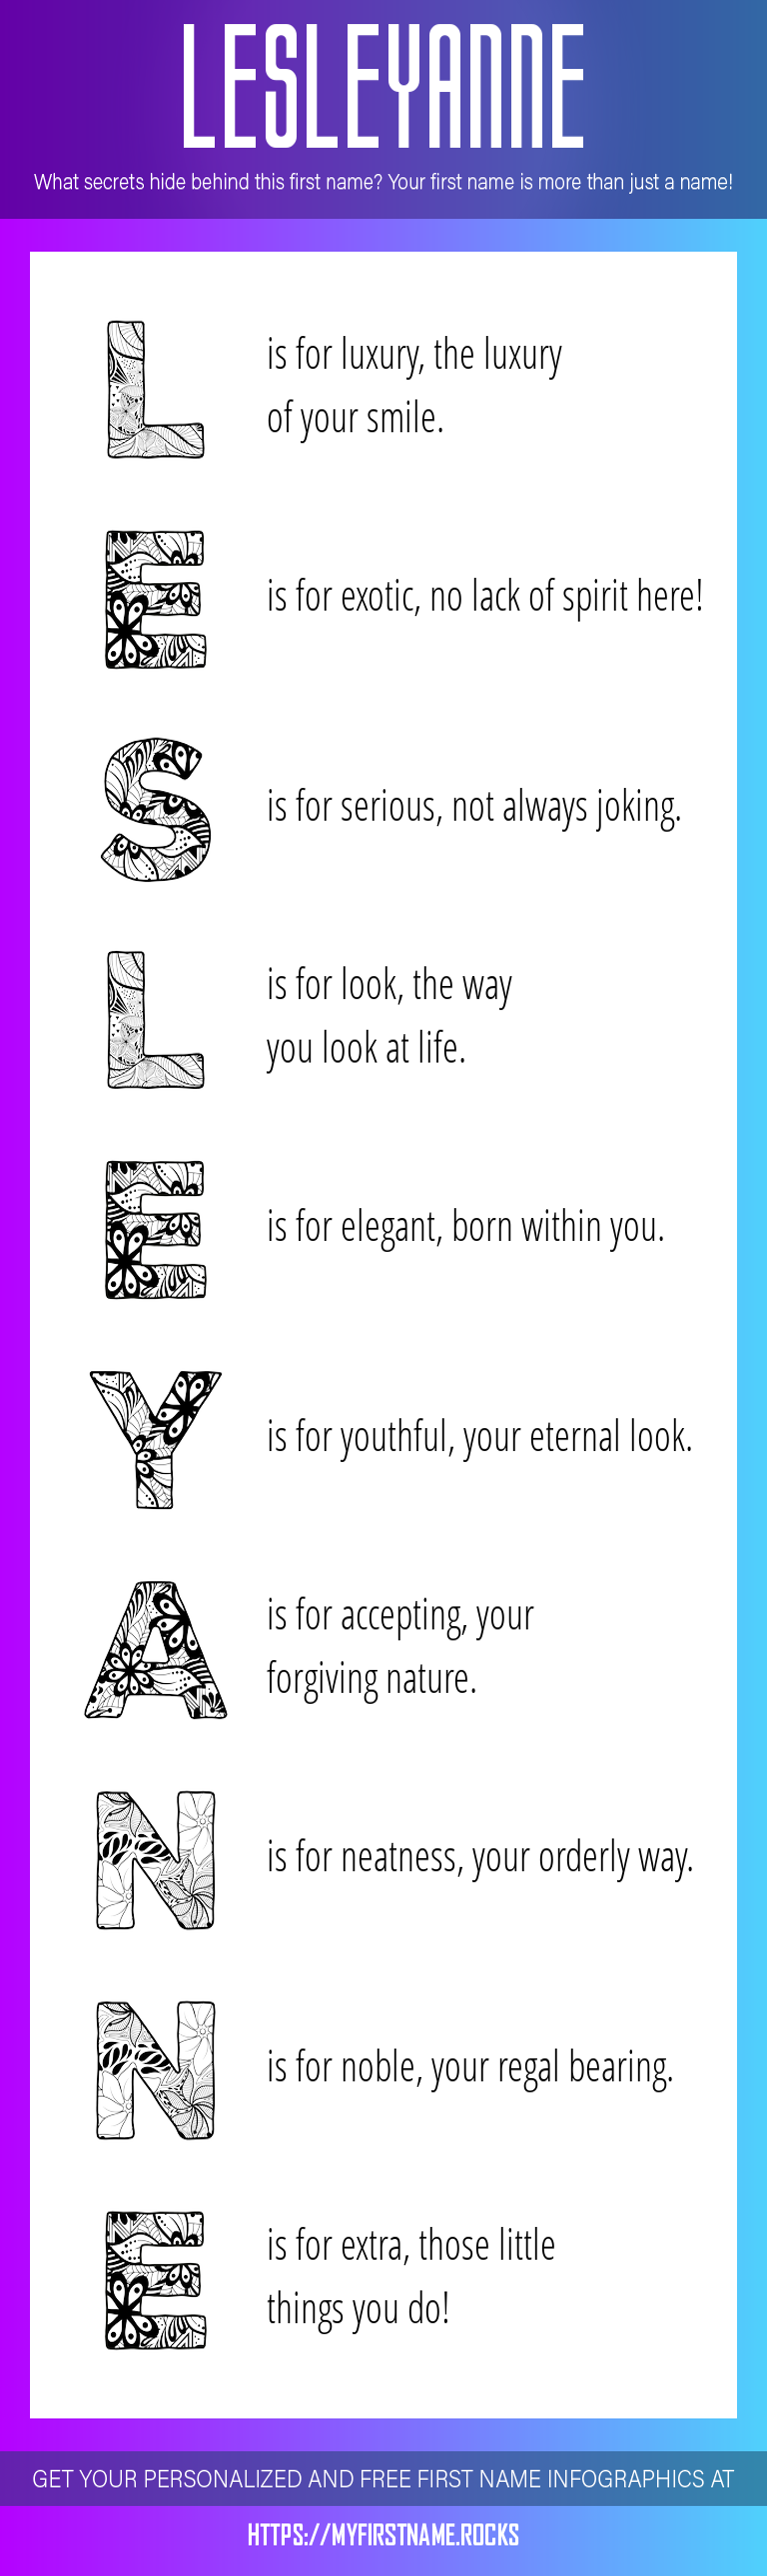 Lesleyanne Infographics